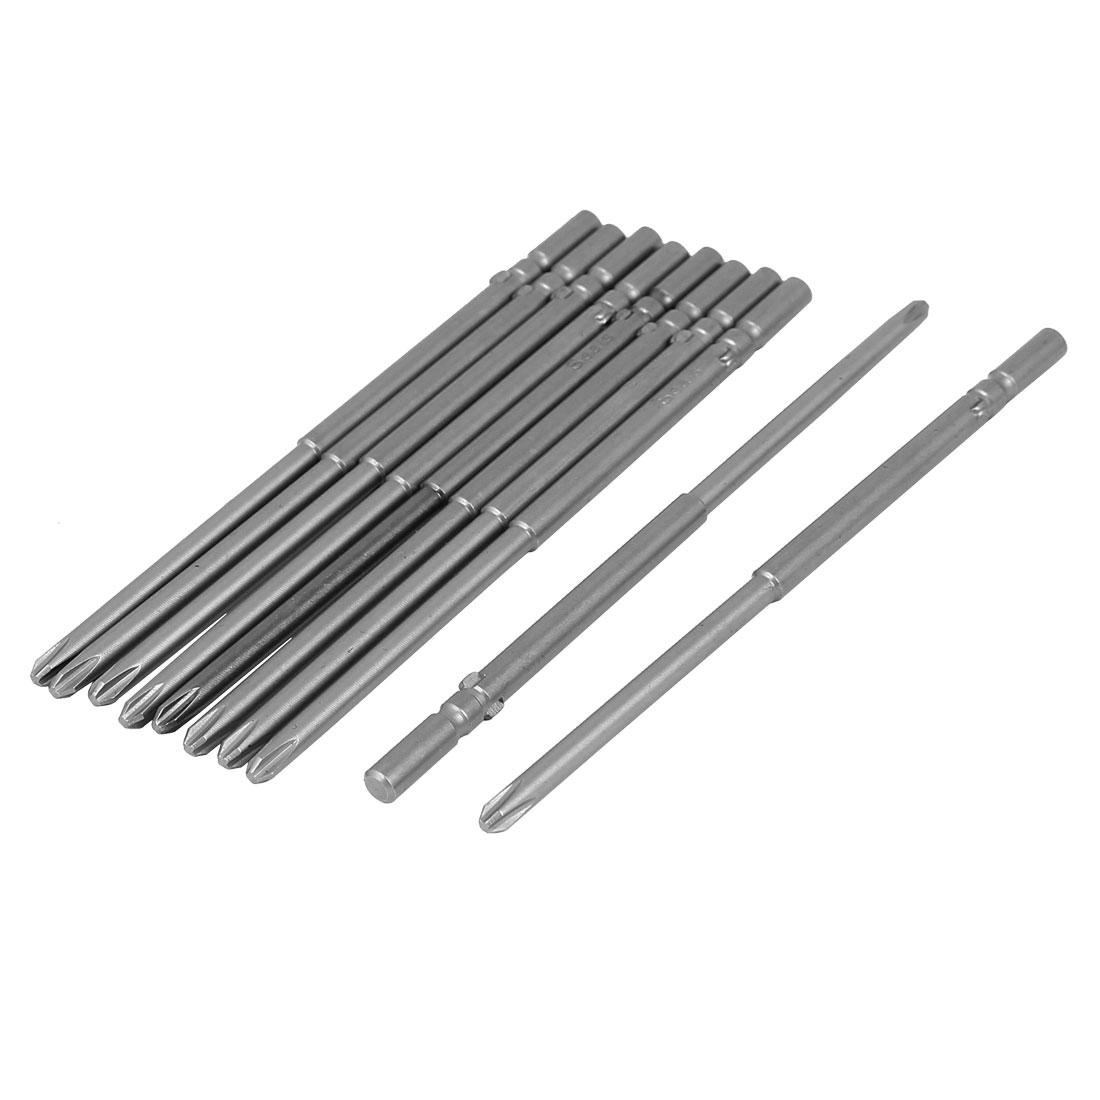 120mm Long 5mm Dia Shank Magnetic Phillips Tip PH2 Cross Head Screwdriver Bits 10pcs